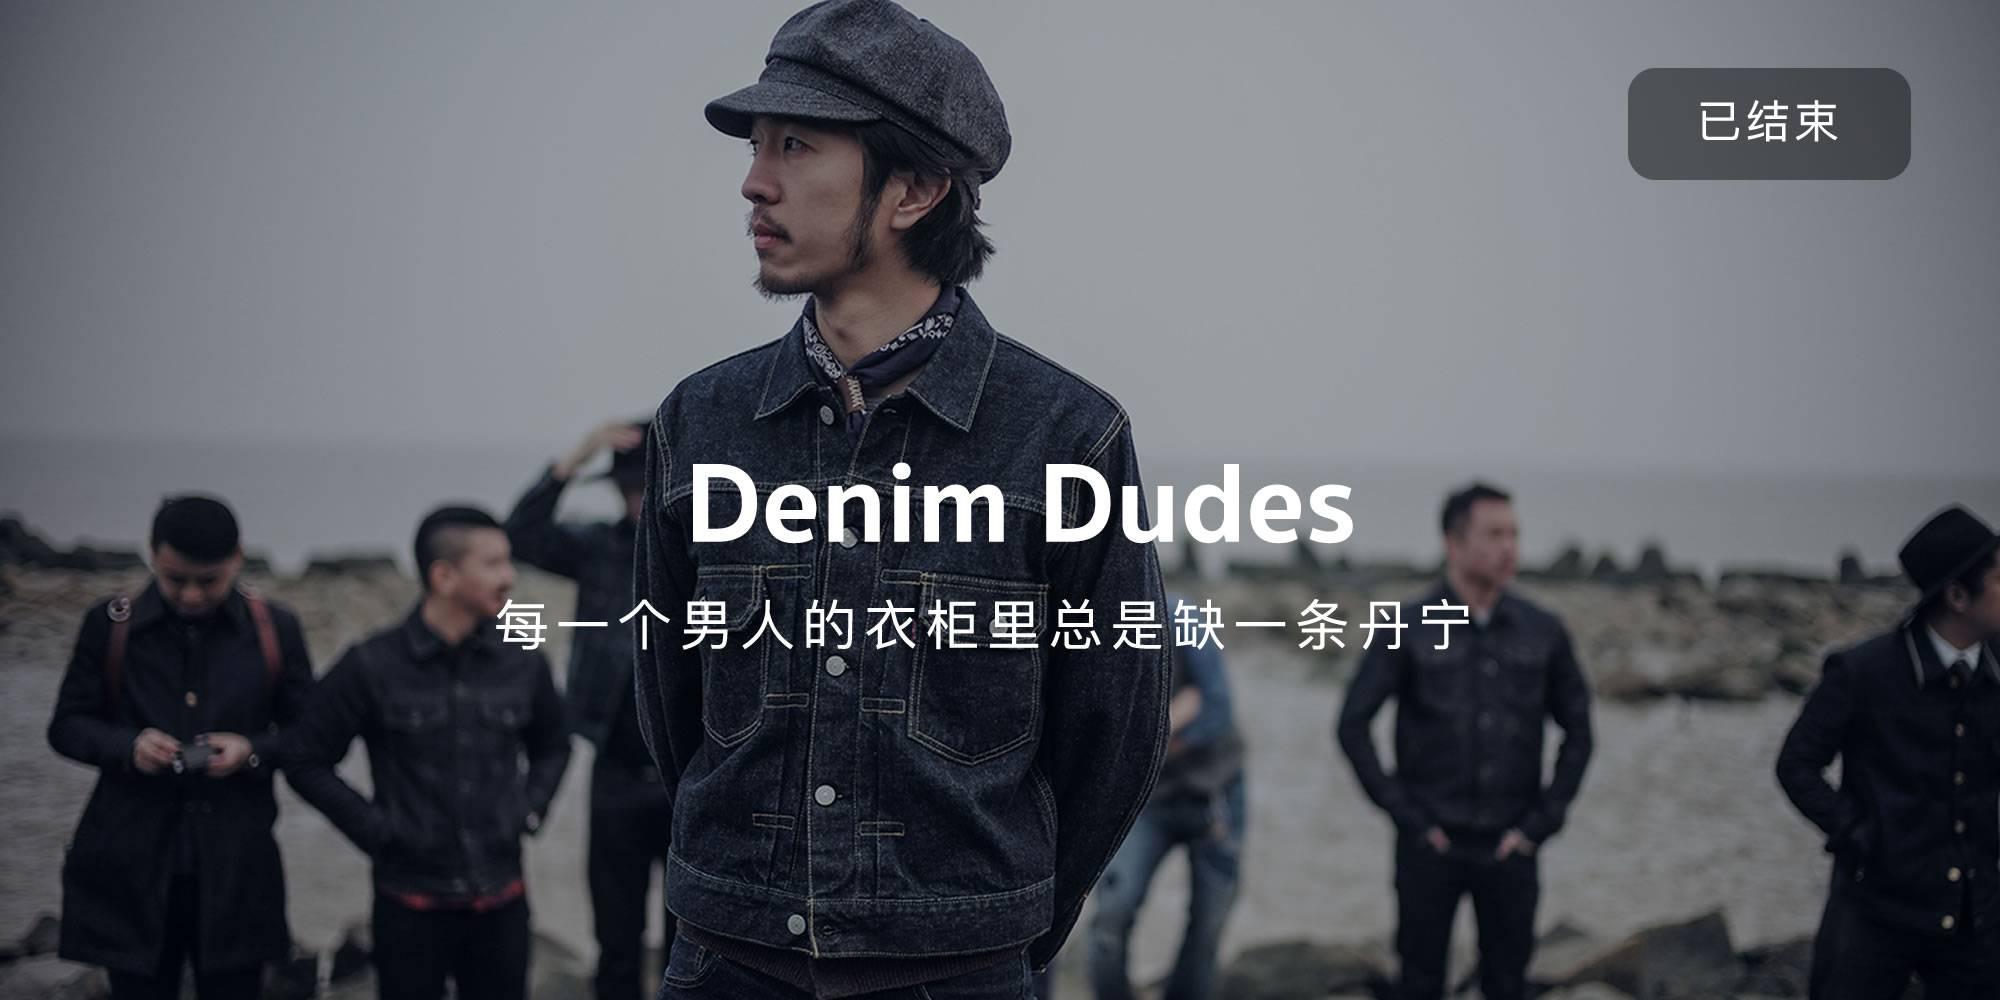 Denim Dudes:每一个男人的衣柜里总是缺一条丹宁